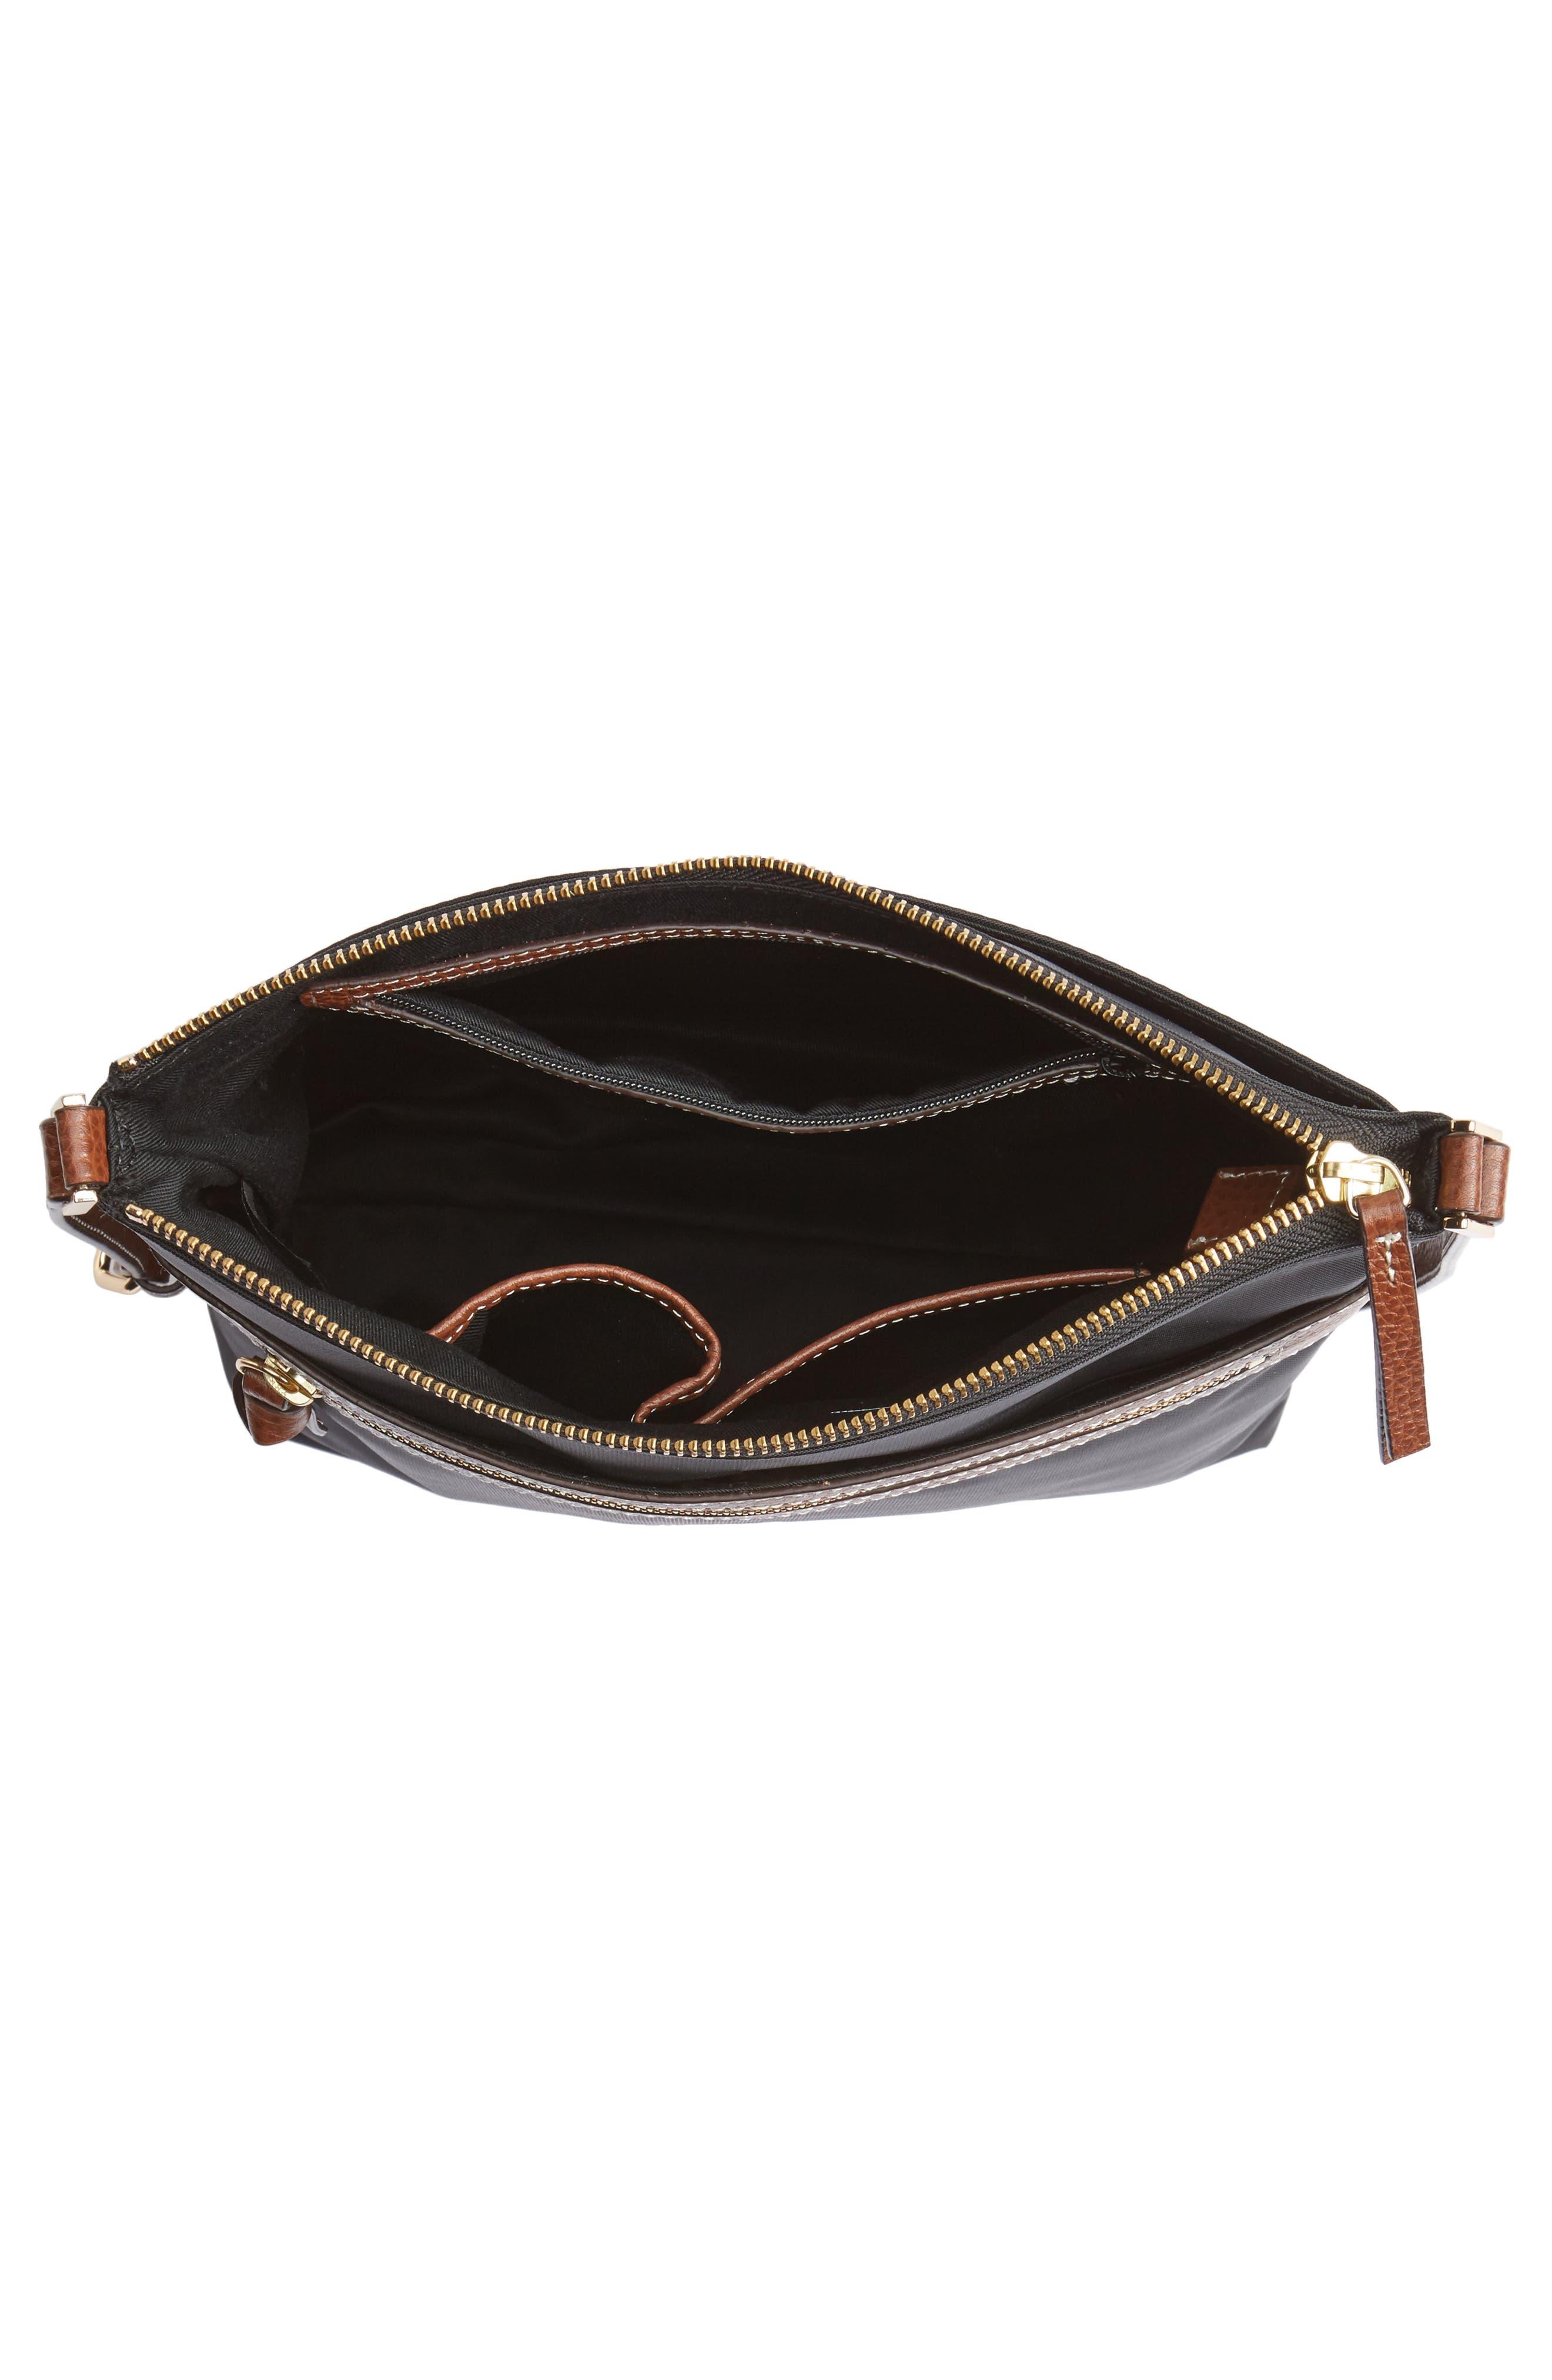 Halogen Nylon Crossbody Bag,                             Alternate thumbnail 4, color,                             001